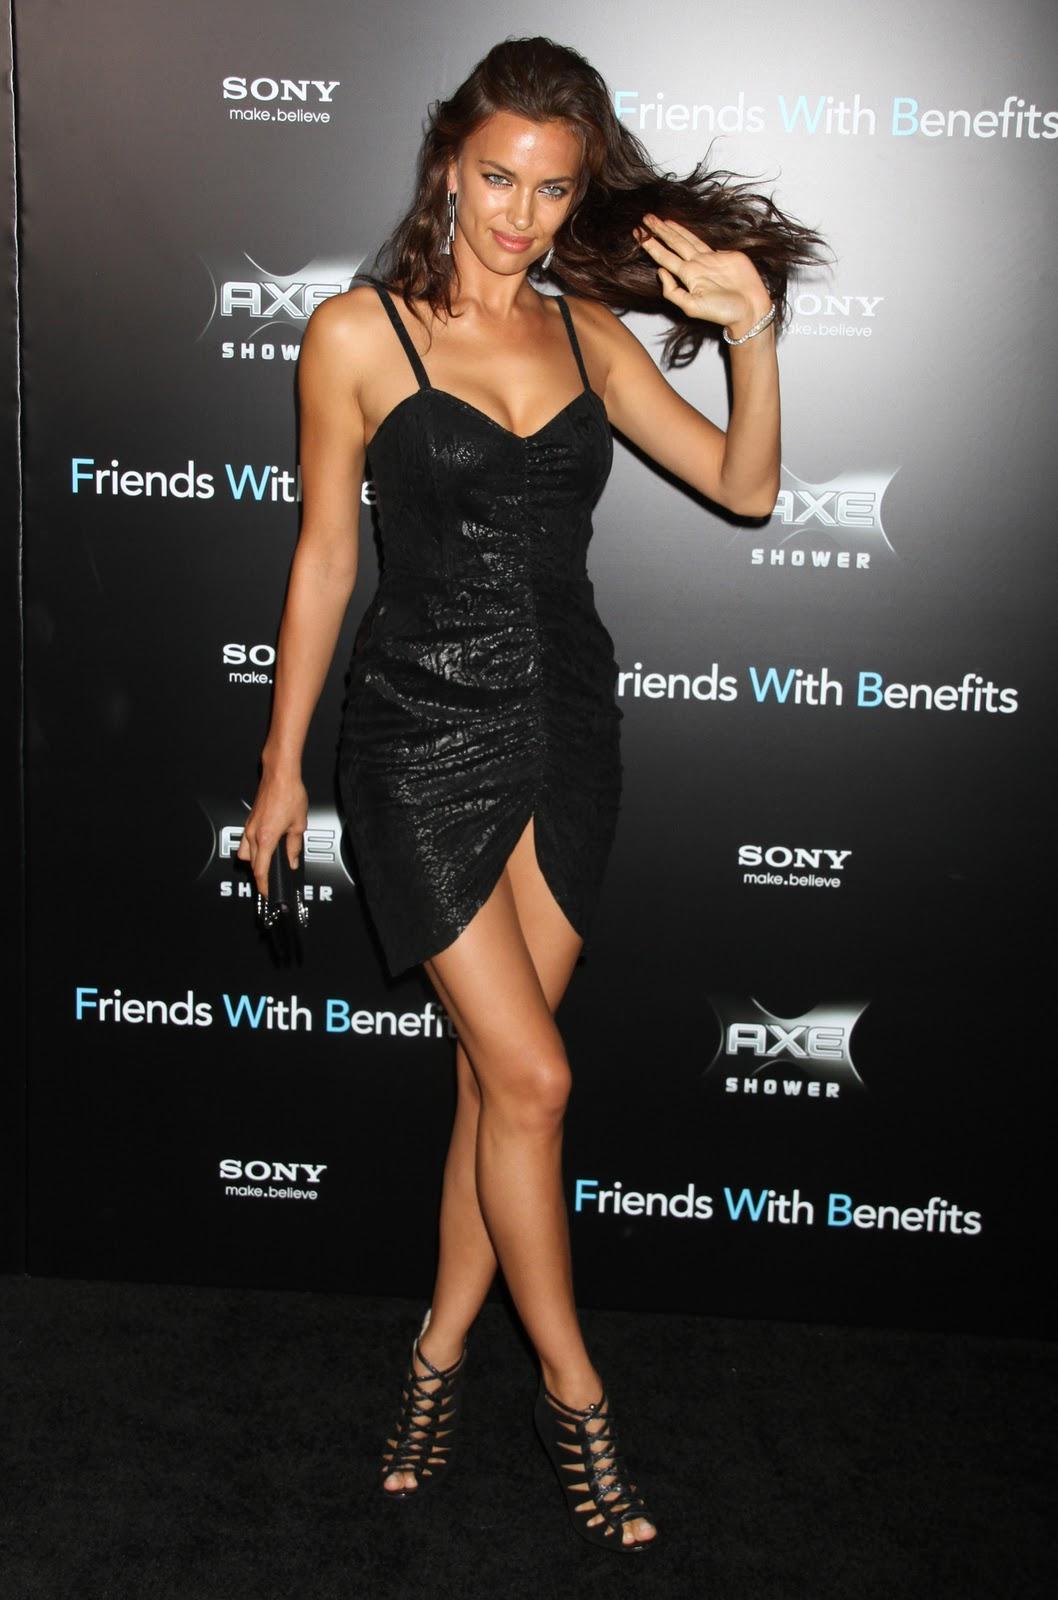 http://2.bp.blogspot.com/-hsx9ekR-Q_8/Ttm8pHGCGbI/AAAAAAAAGyE/fGrjjrBSdrE/s1600/Irina+Shayk+in+Black+Dress+%25282%2529.jpg